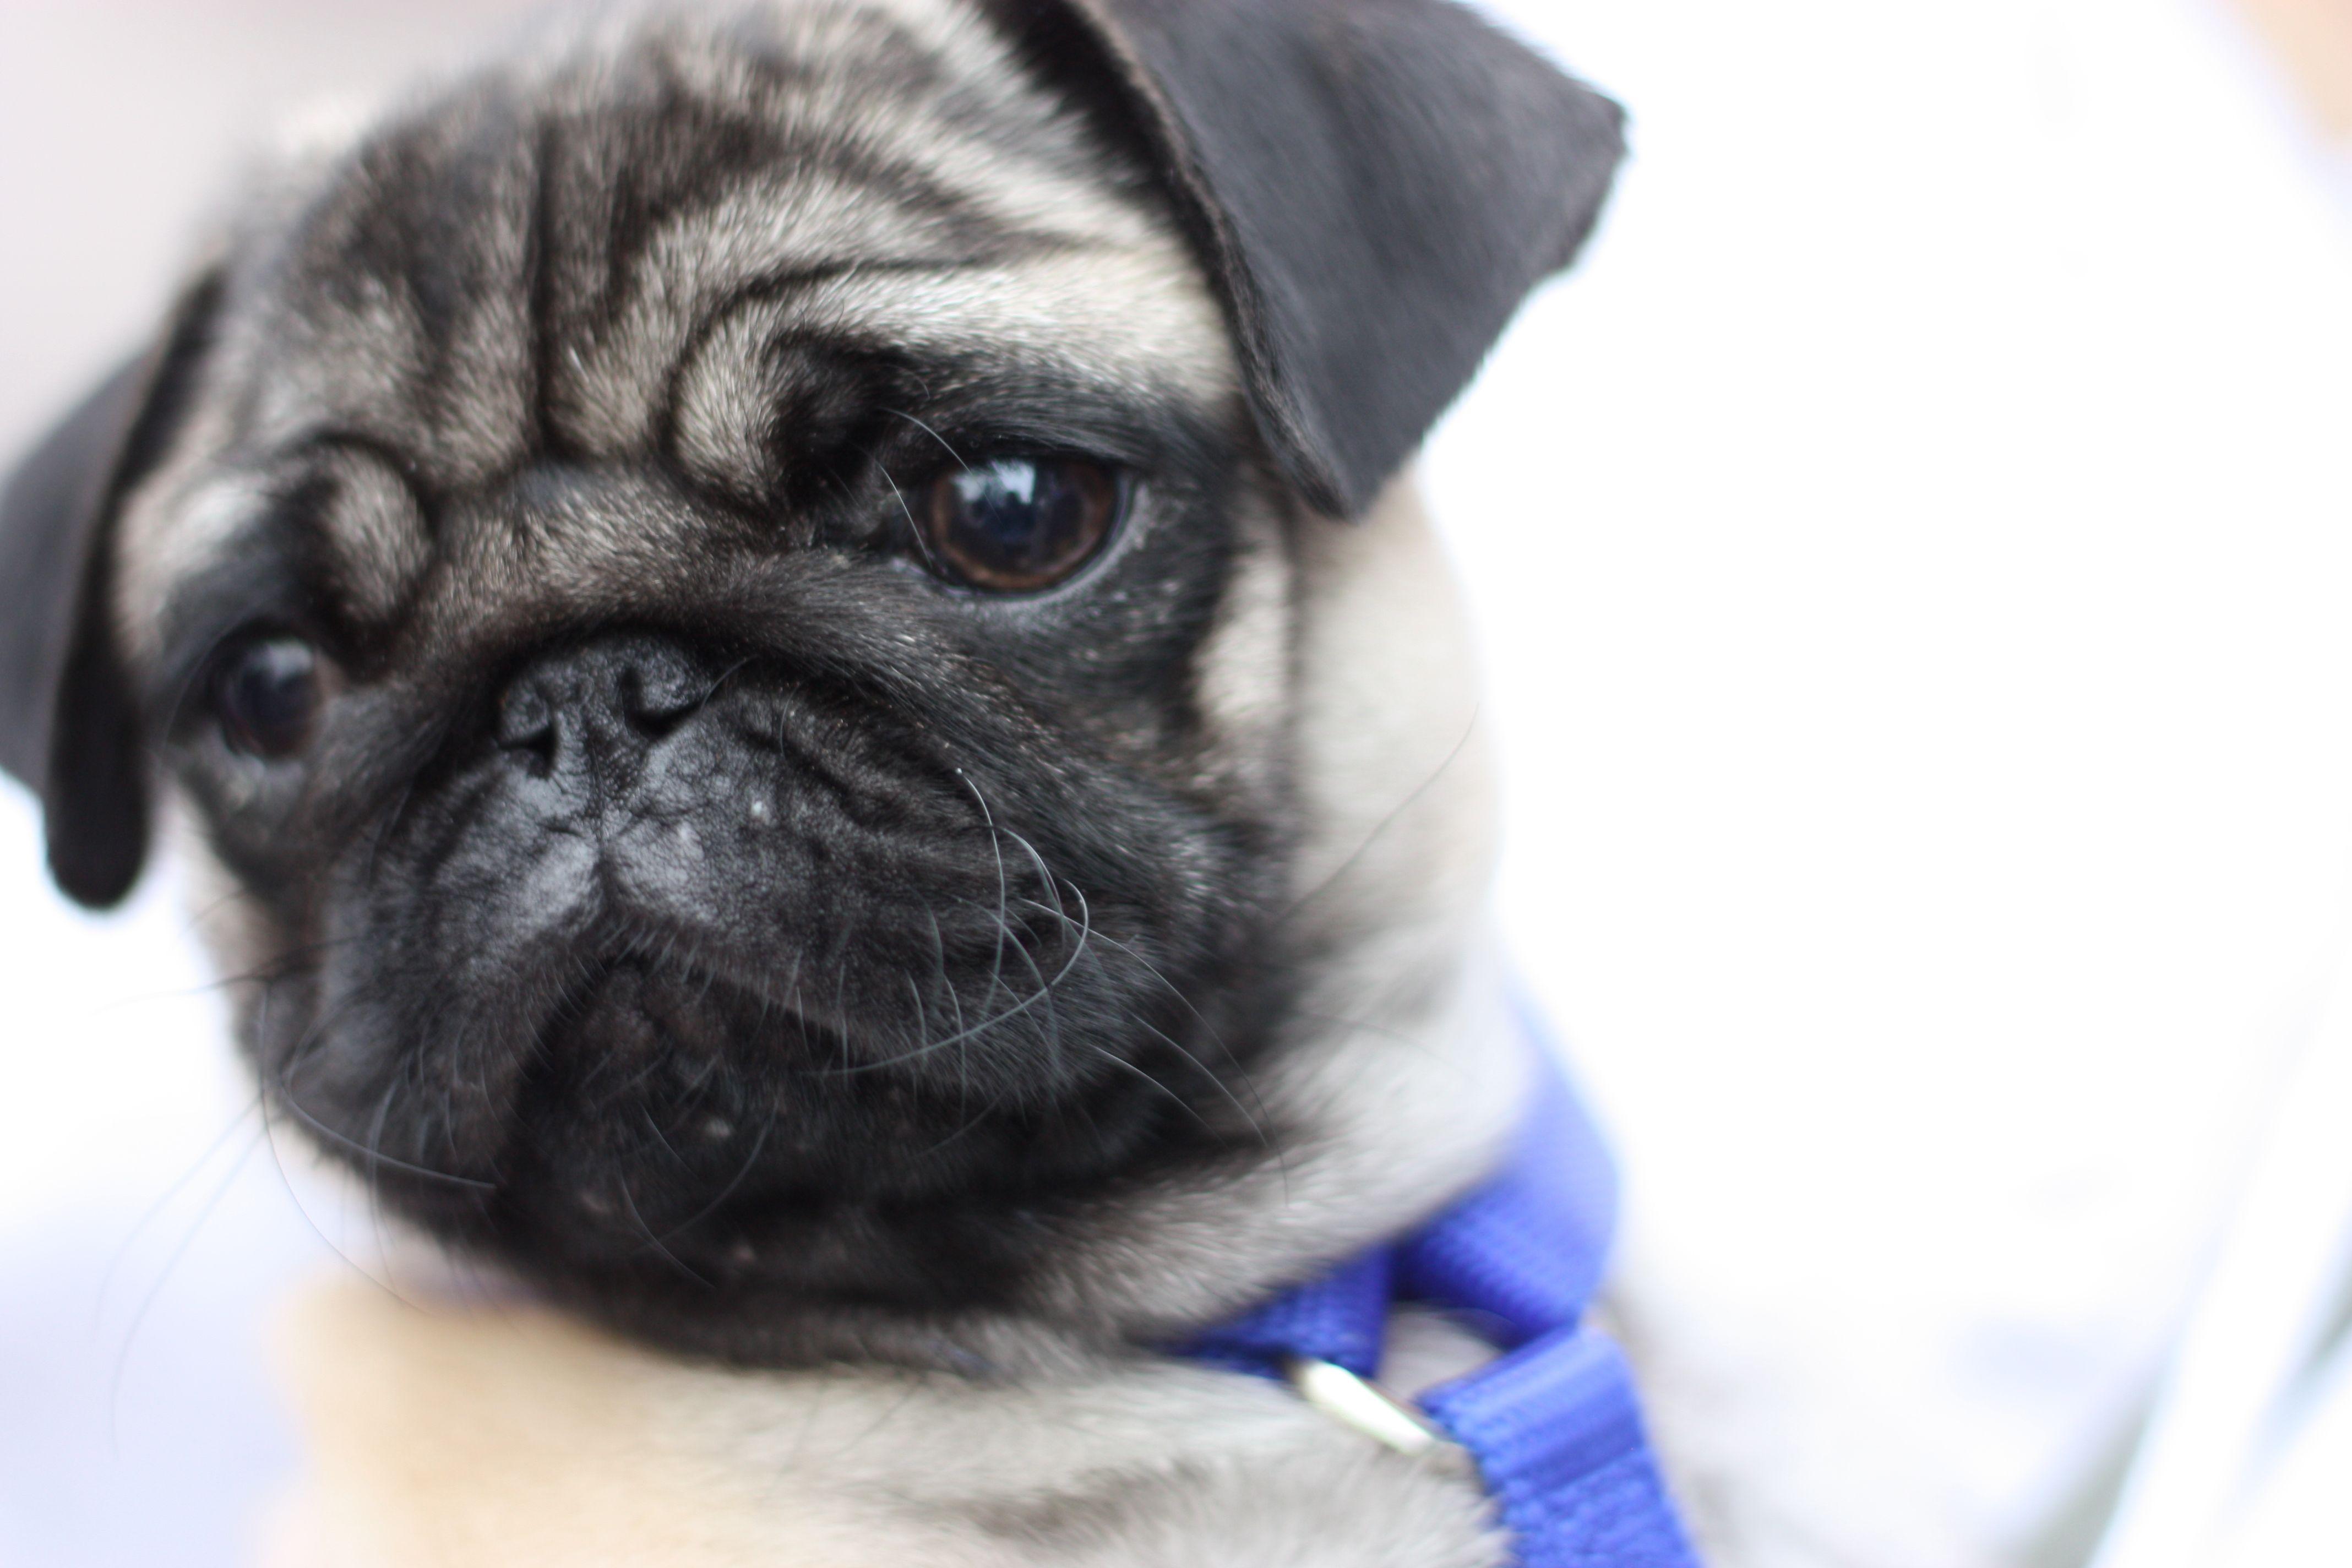 Cute Pug Puppy Cute Pug Puppies Pug Puppies Black Pug Puppies Wallpaper pug dog pet friend black